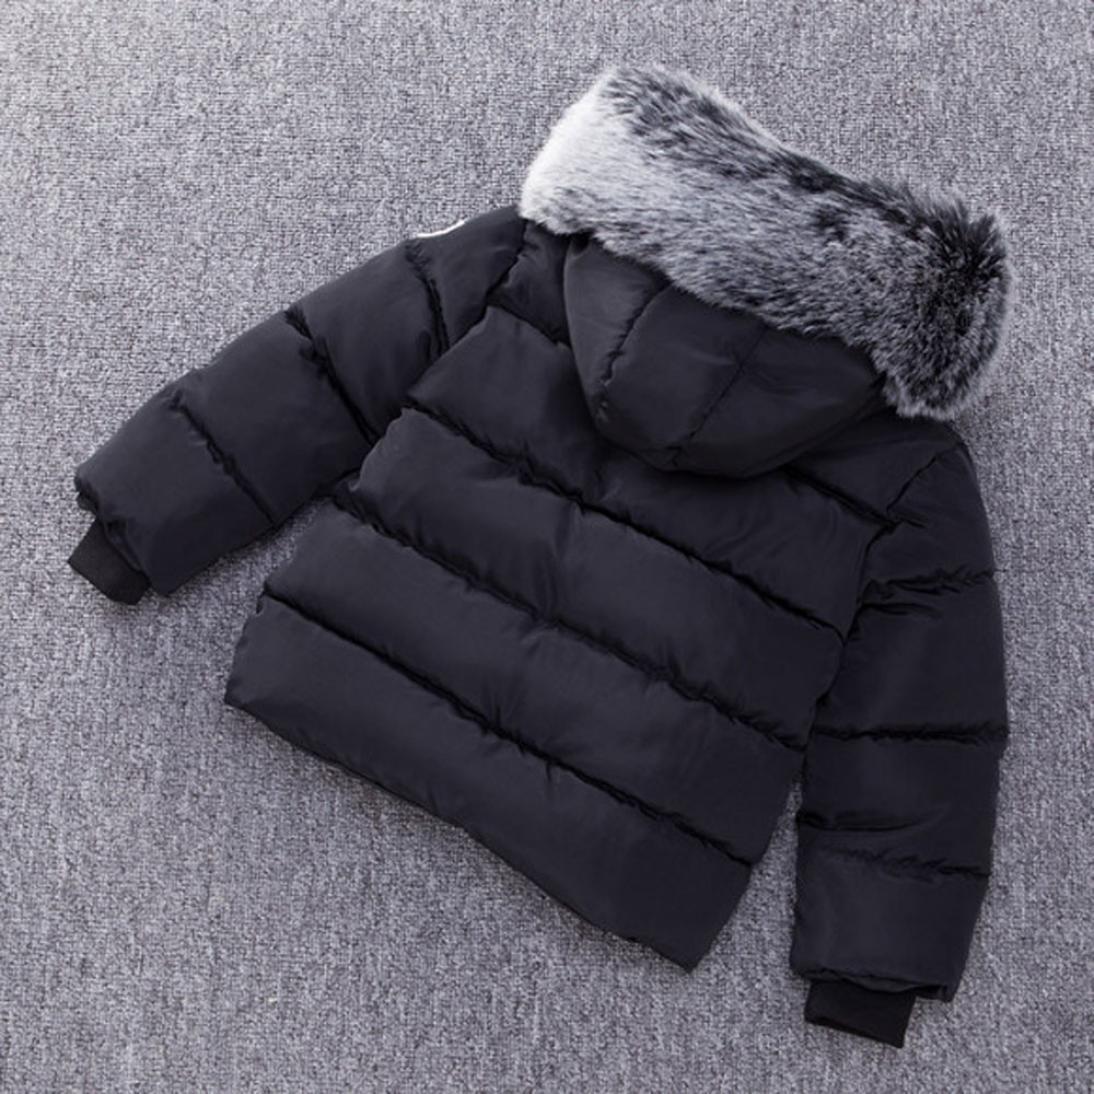 78e316dc6d82 Amazon.com  Vicbovo Toddler Baby Boy Kids Trendy Hooded Fur Down ...